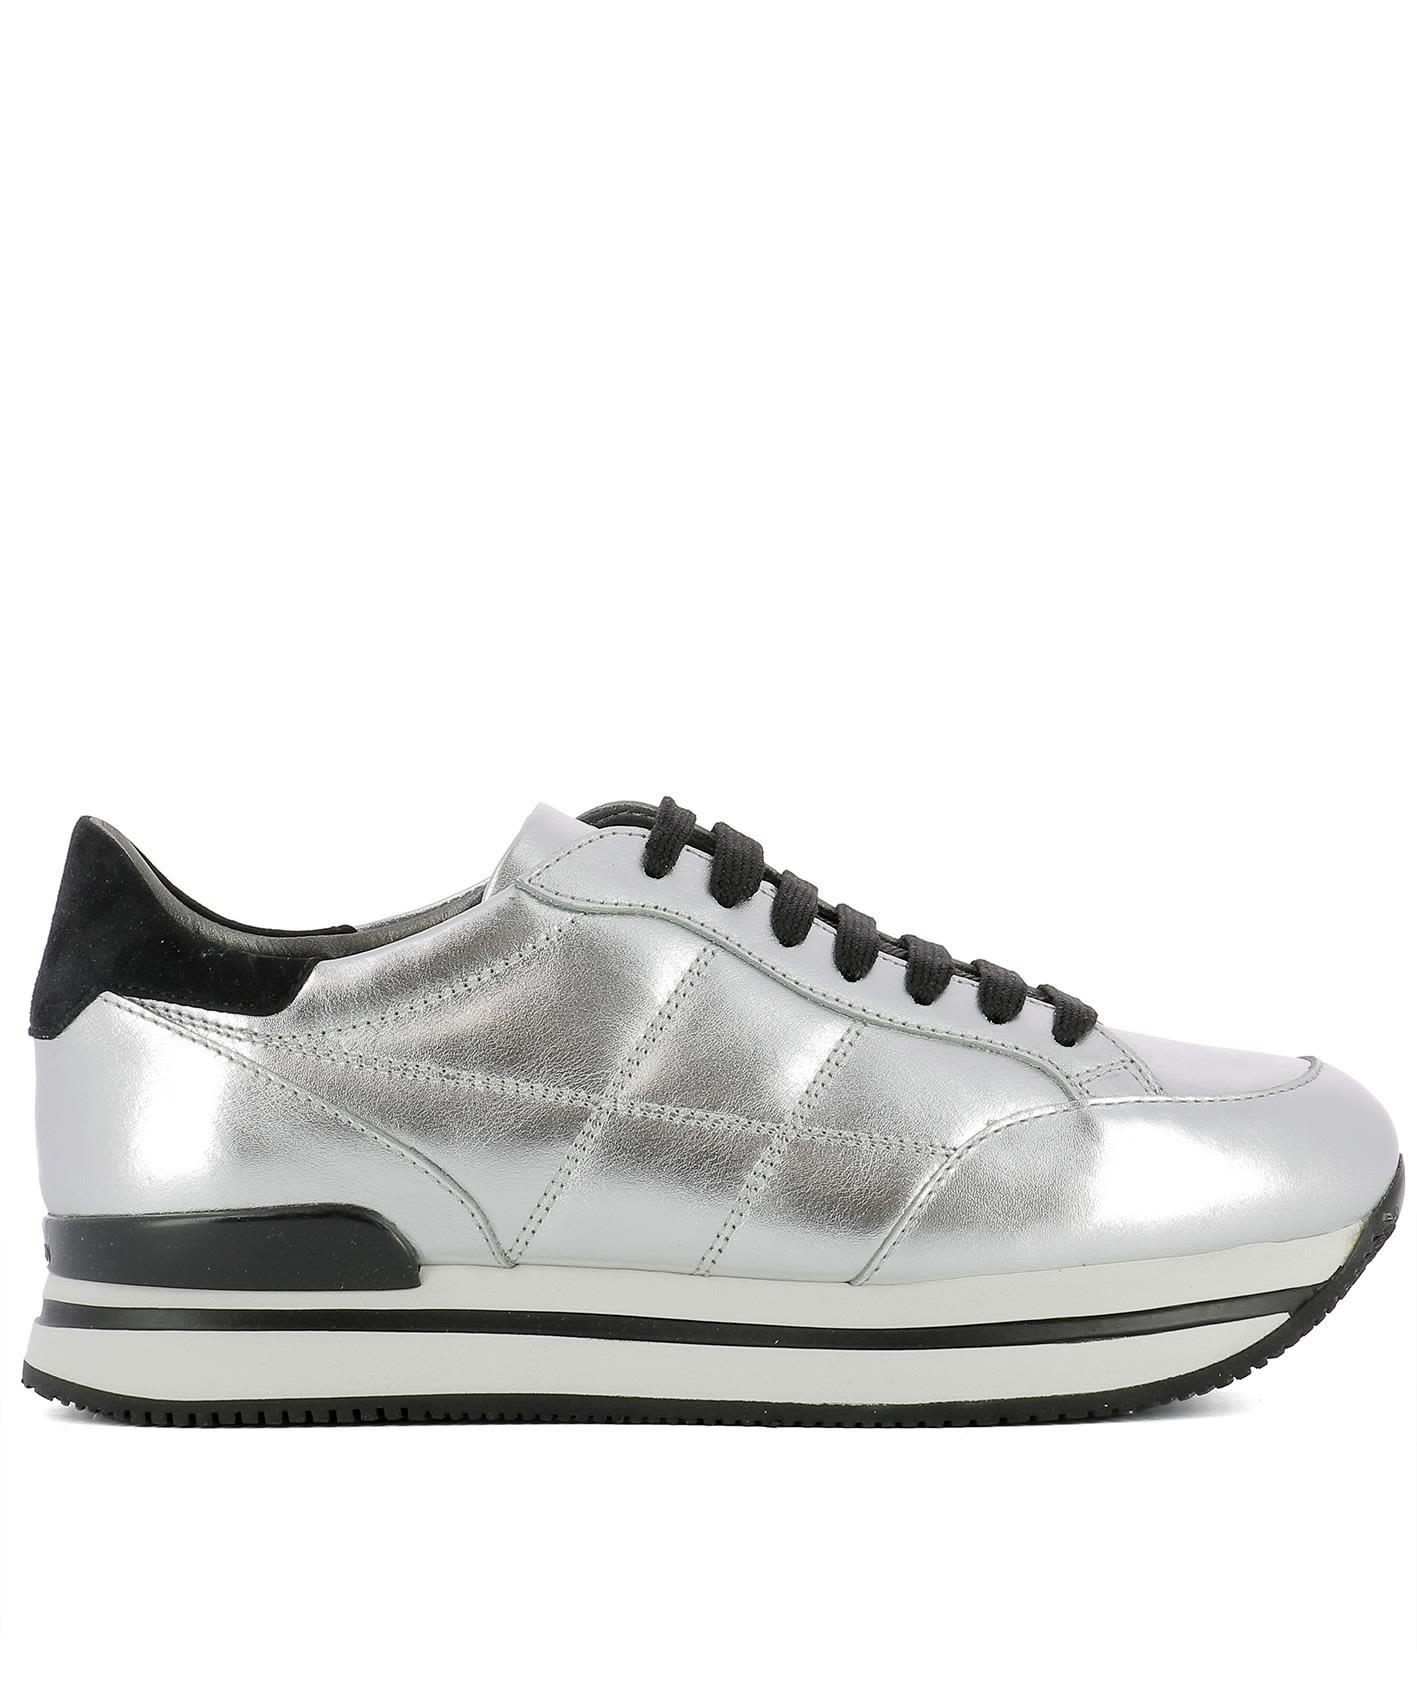 ea44f7eaaa0 Hogan Maxi H222 Sneakers In Metallic-Effect Leather In Silver